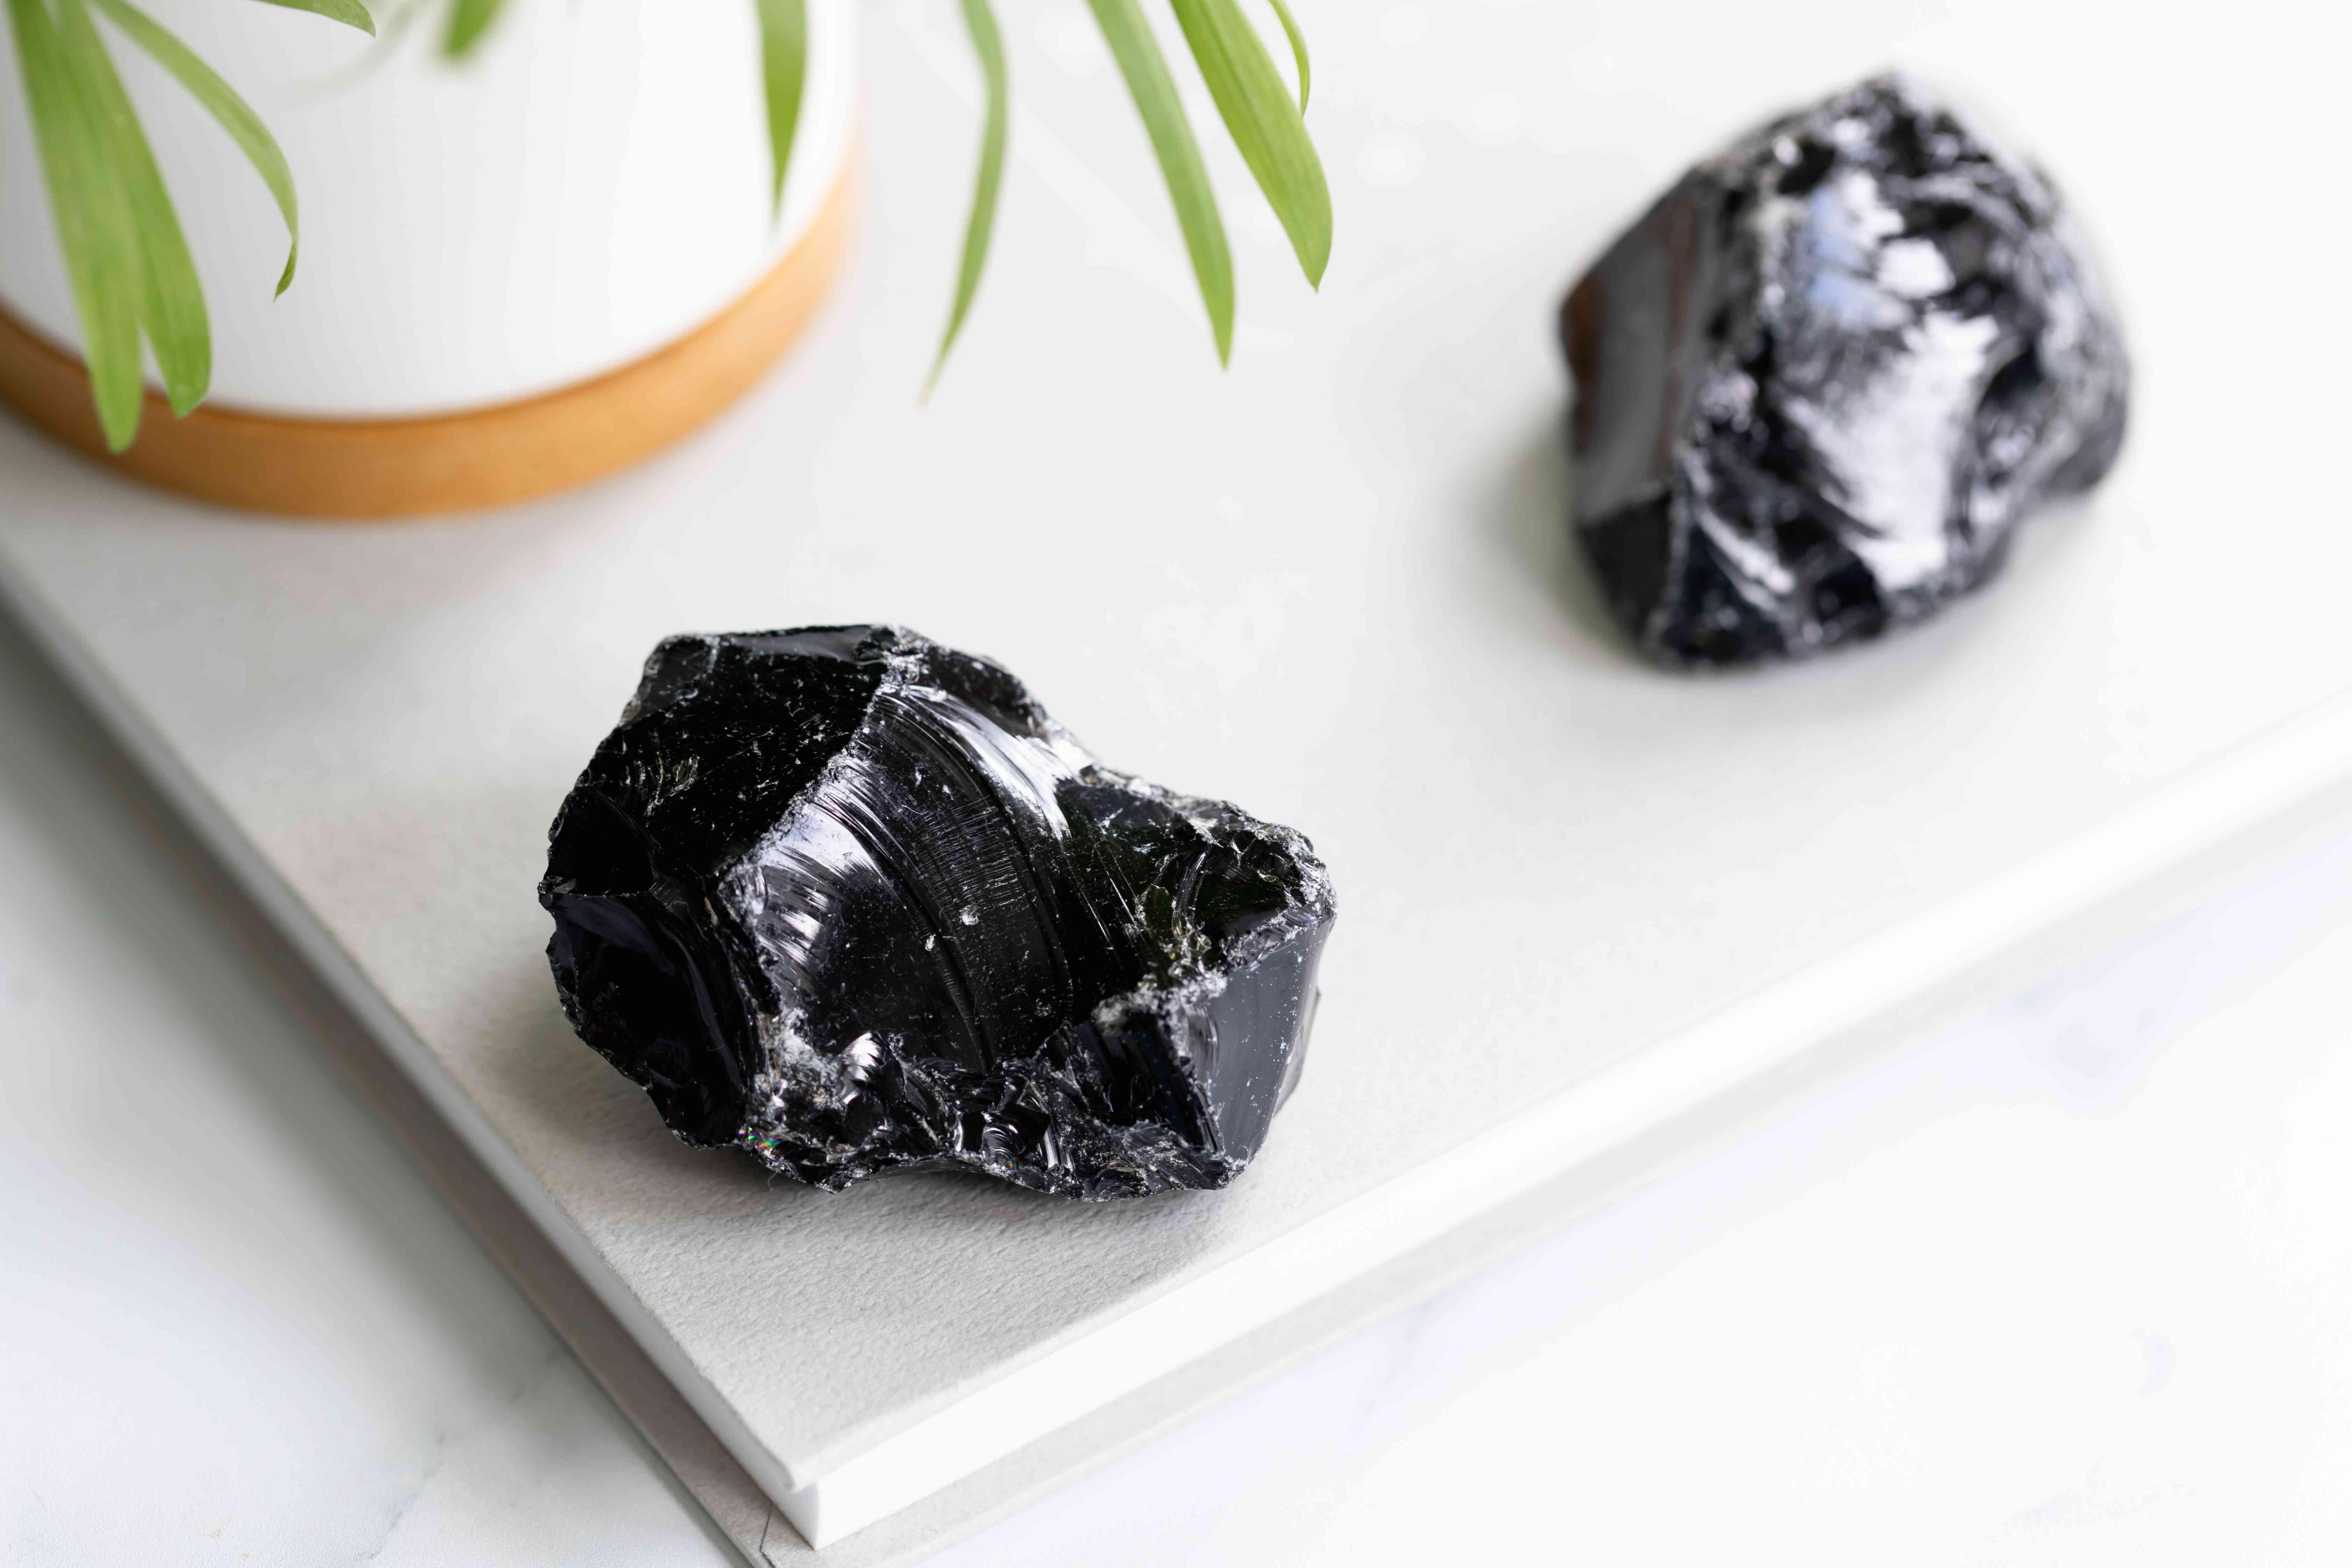 pieces of black obsidian near a plant